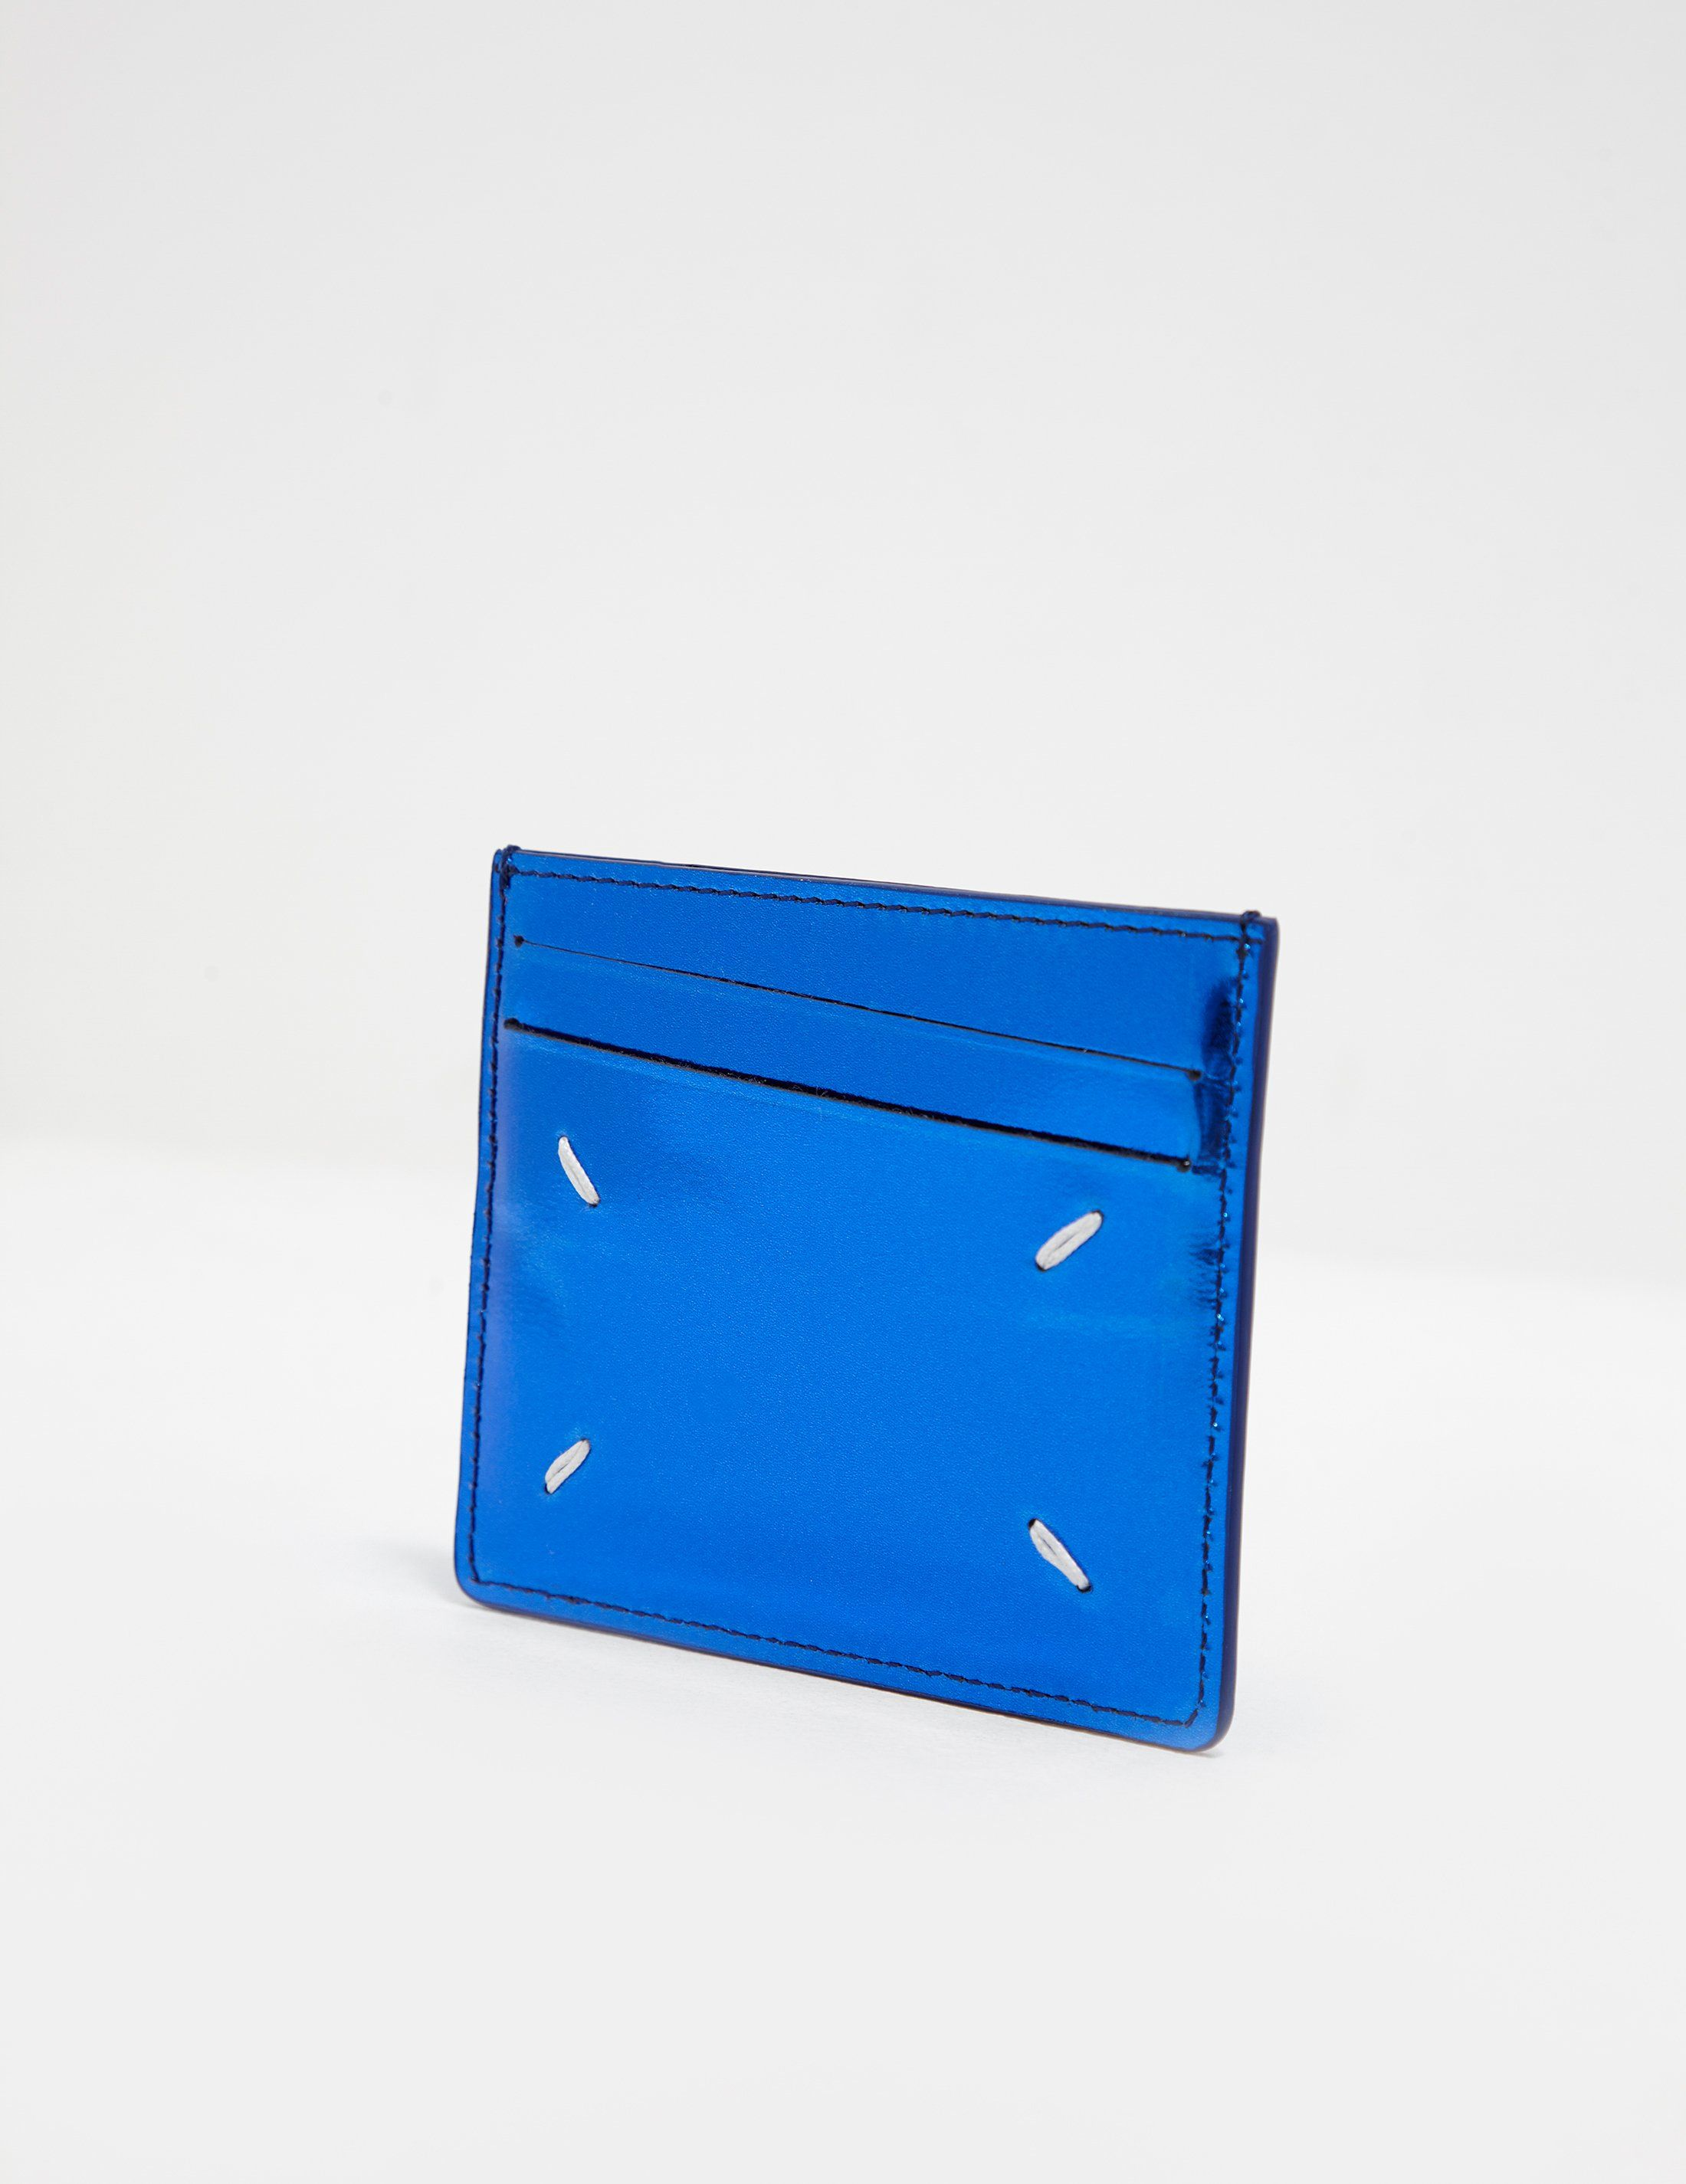 Maison Margiela Foil Card Holder